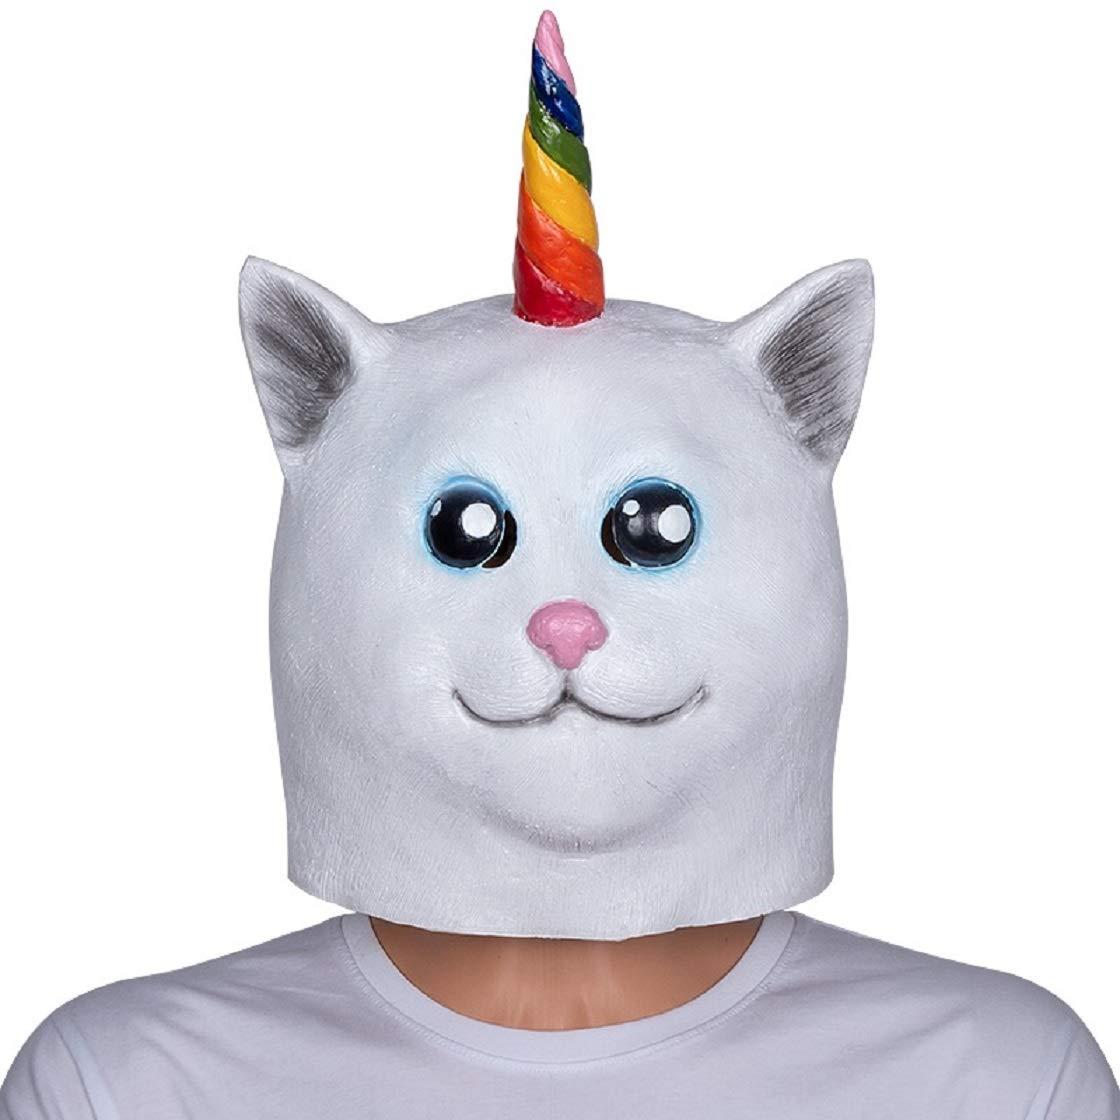 Nicky Bigs Novelties Unicorn Cat Mask,One Size